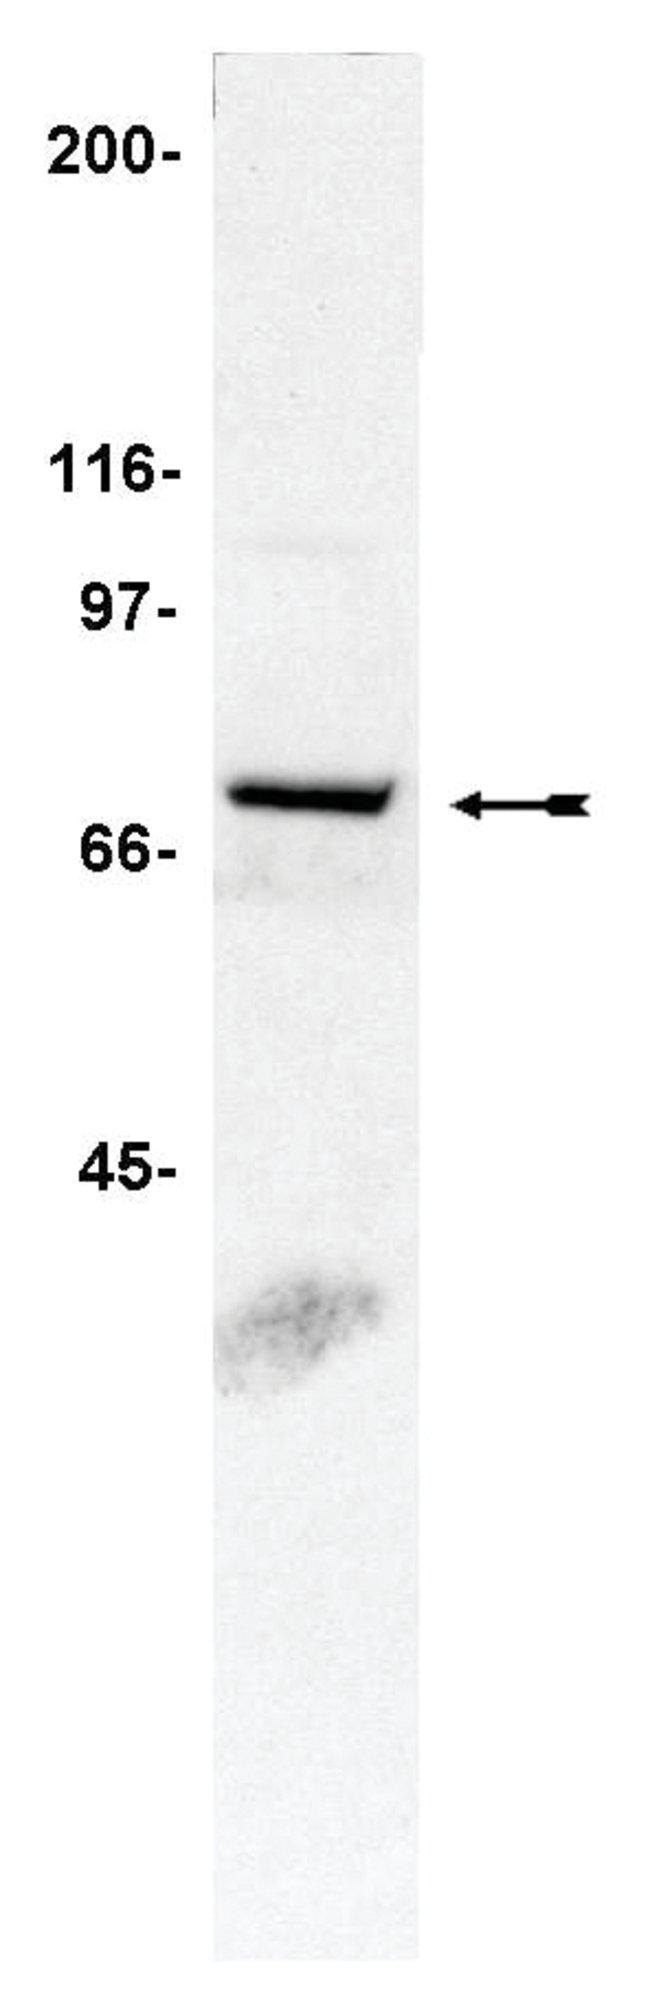 MilliporeSigma anti-NADPH Oxidase (phox) (gp91); Polyclonal;  (Upstate)